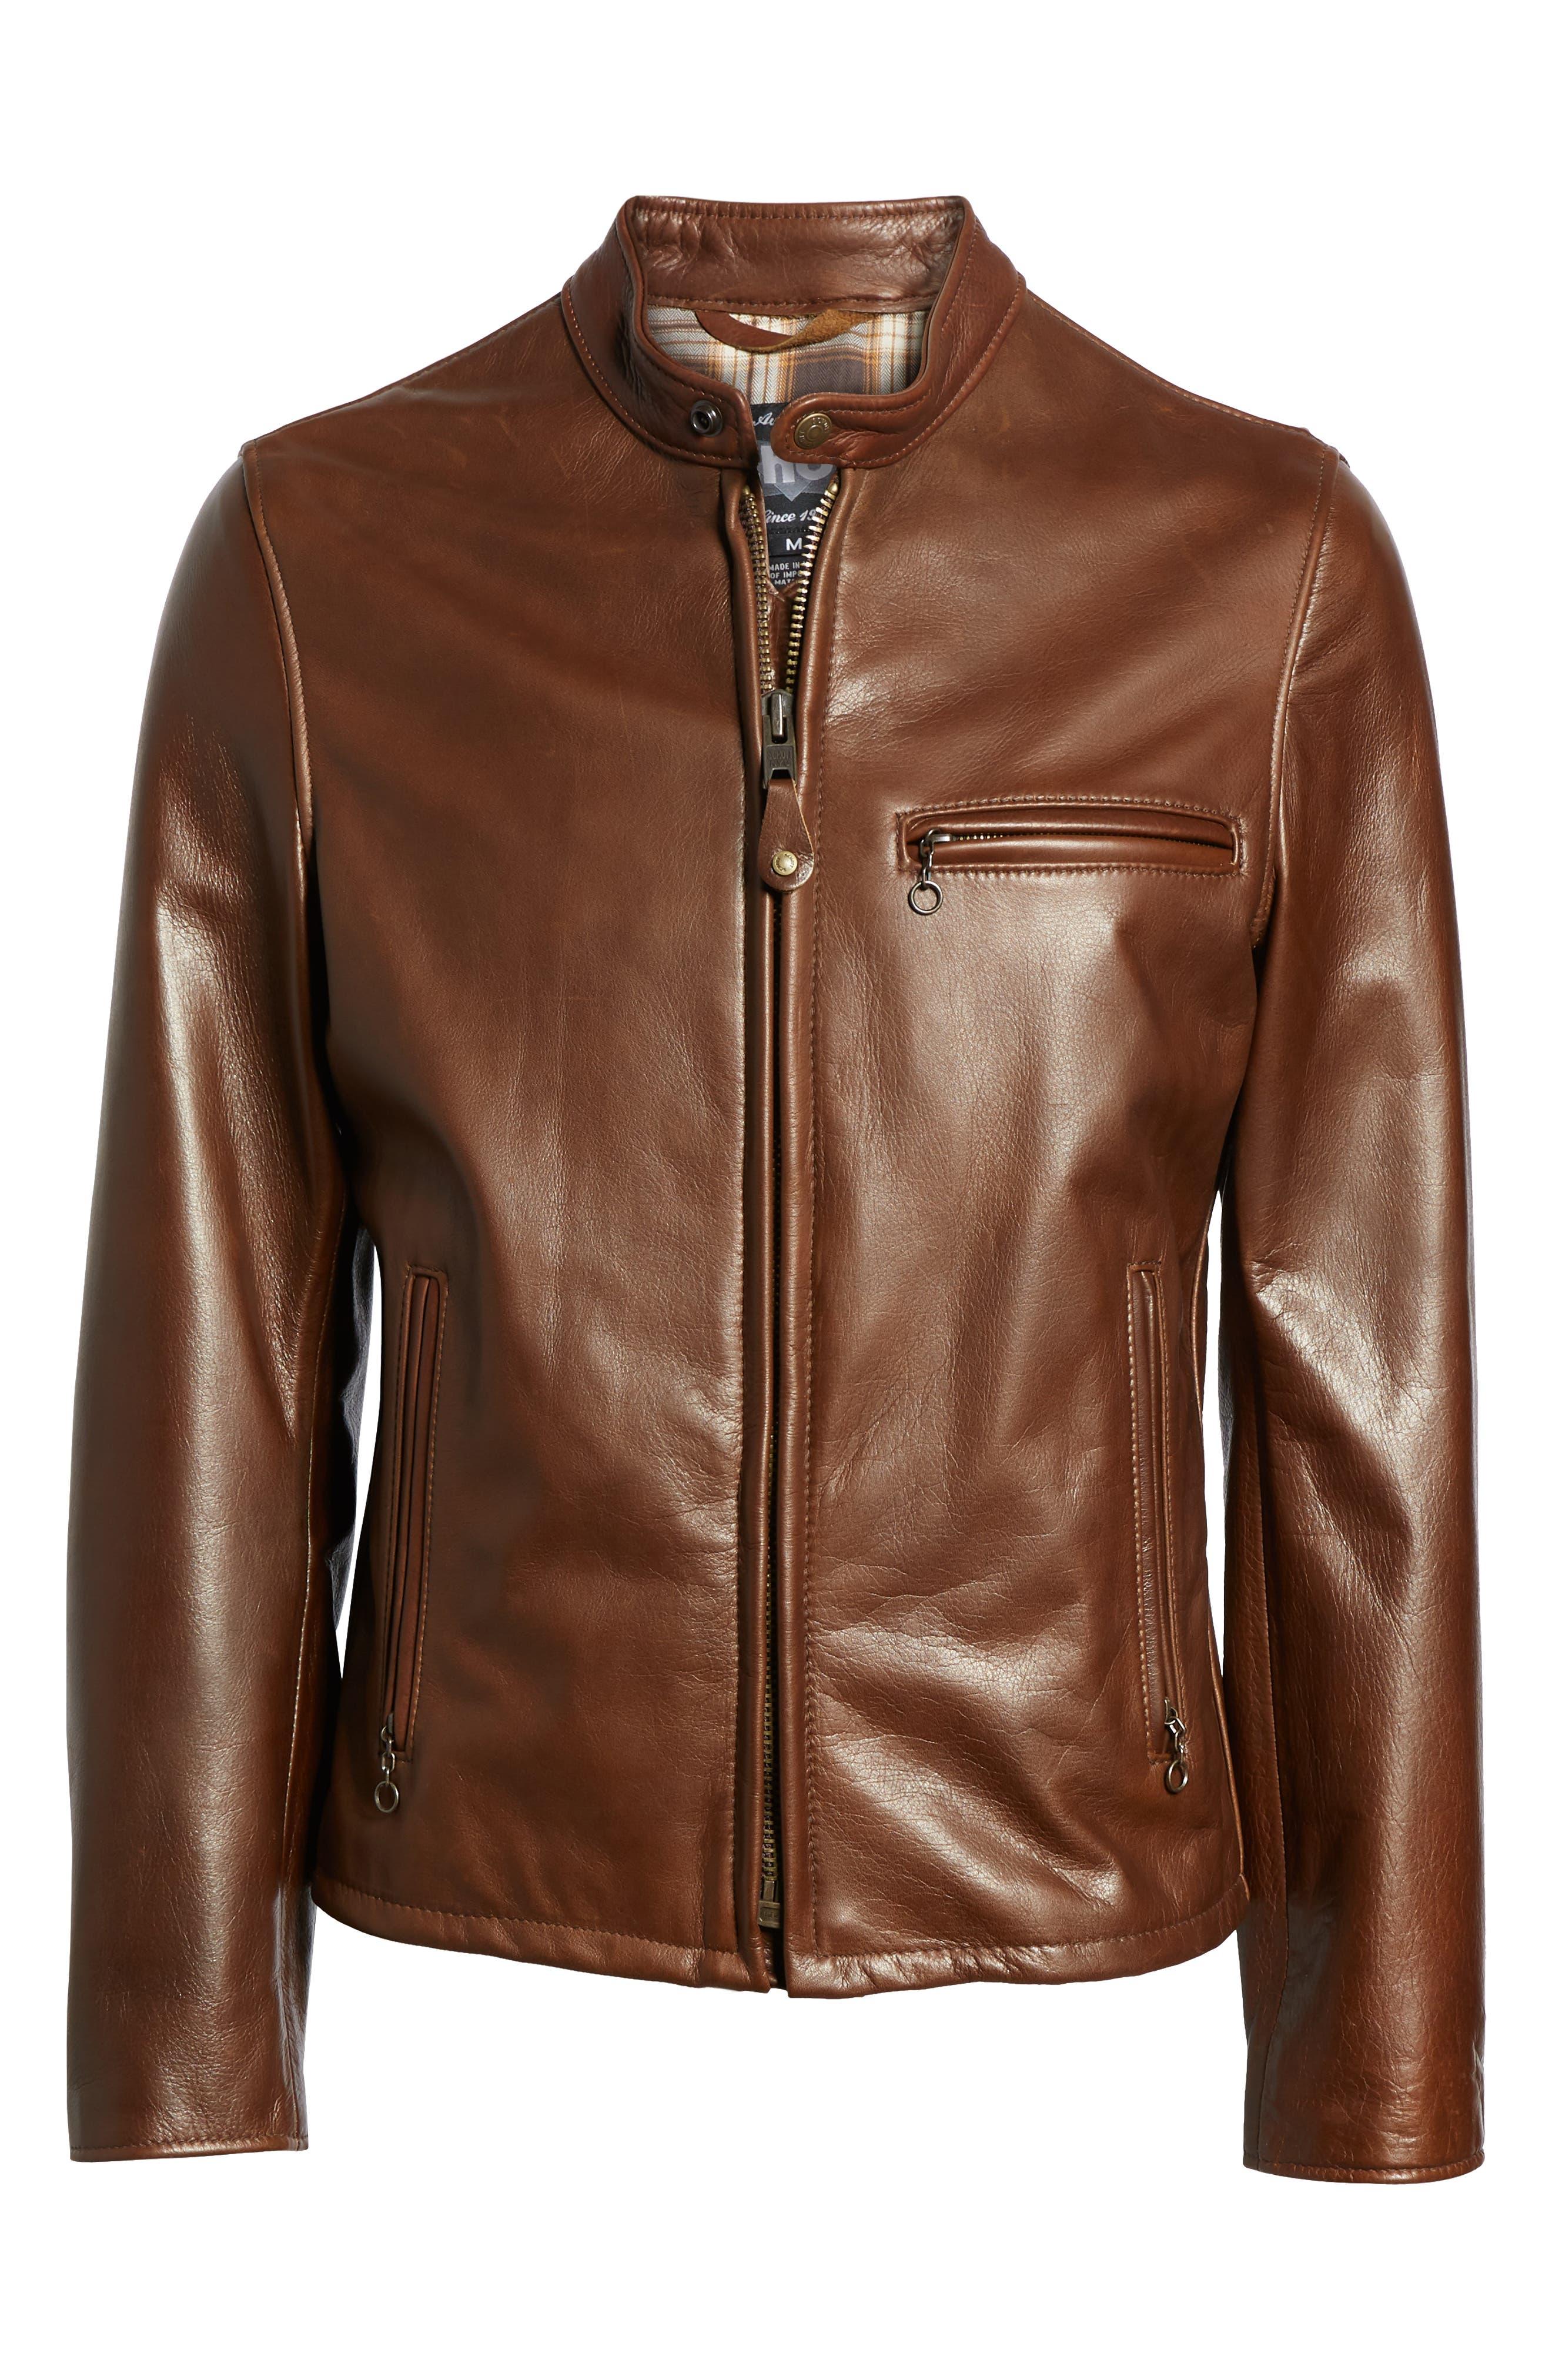 97c974387549 Men s Leather (Genuine) Coats   Jackets